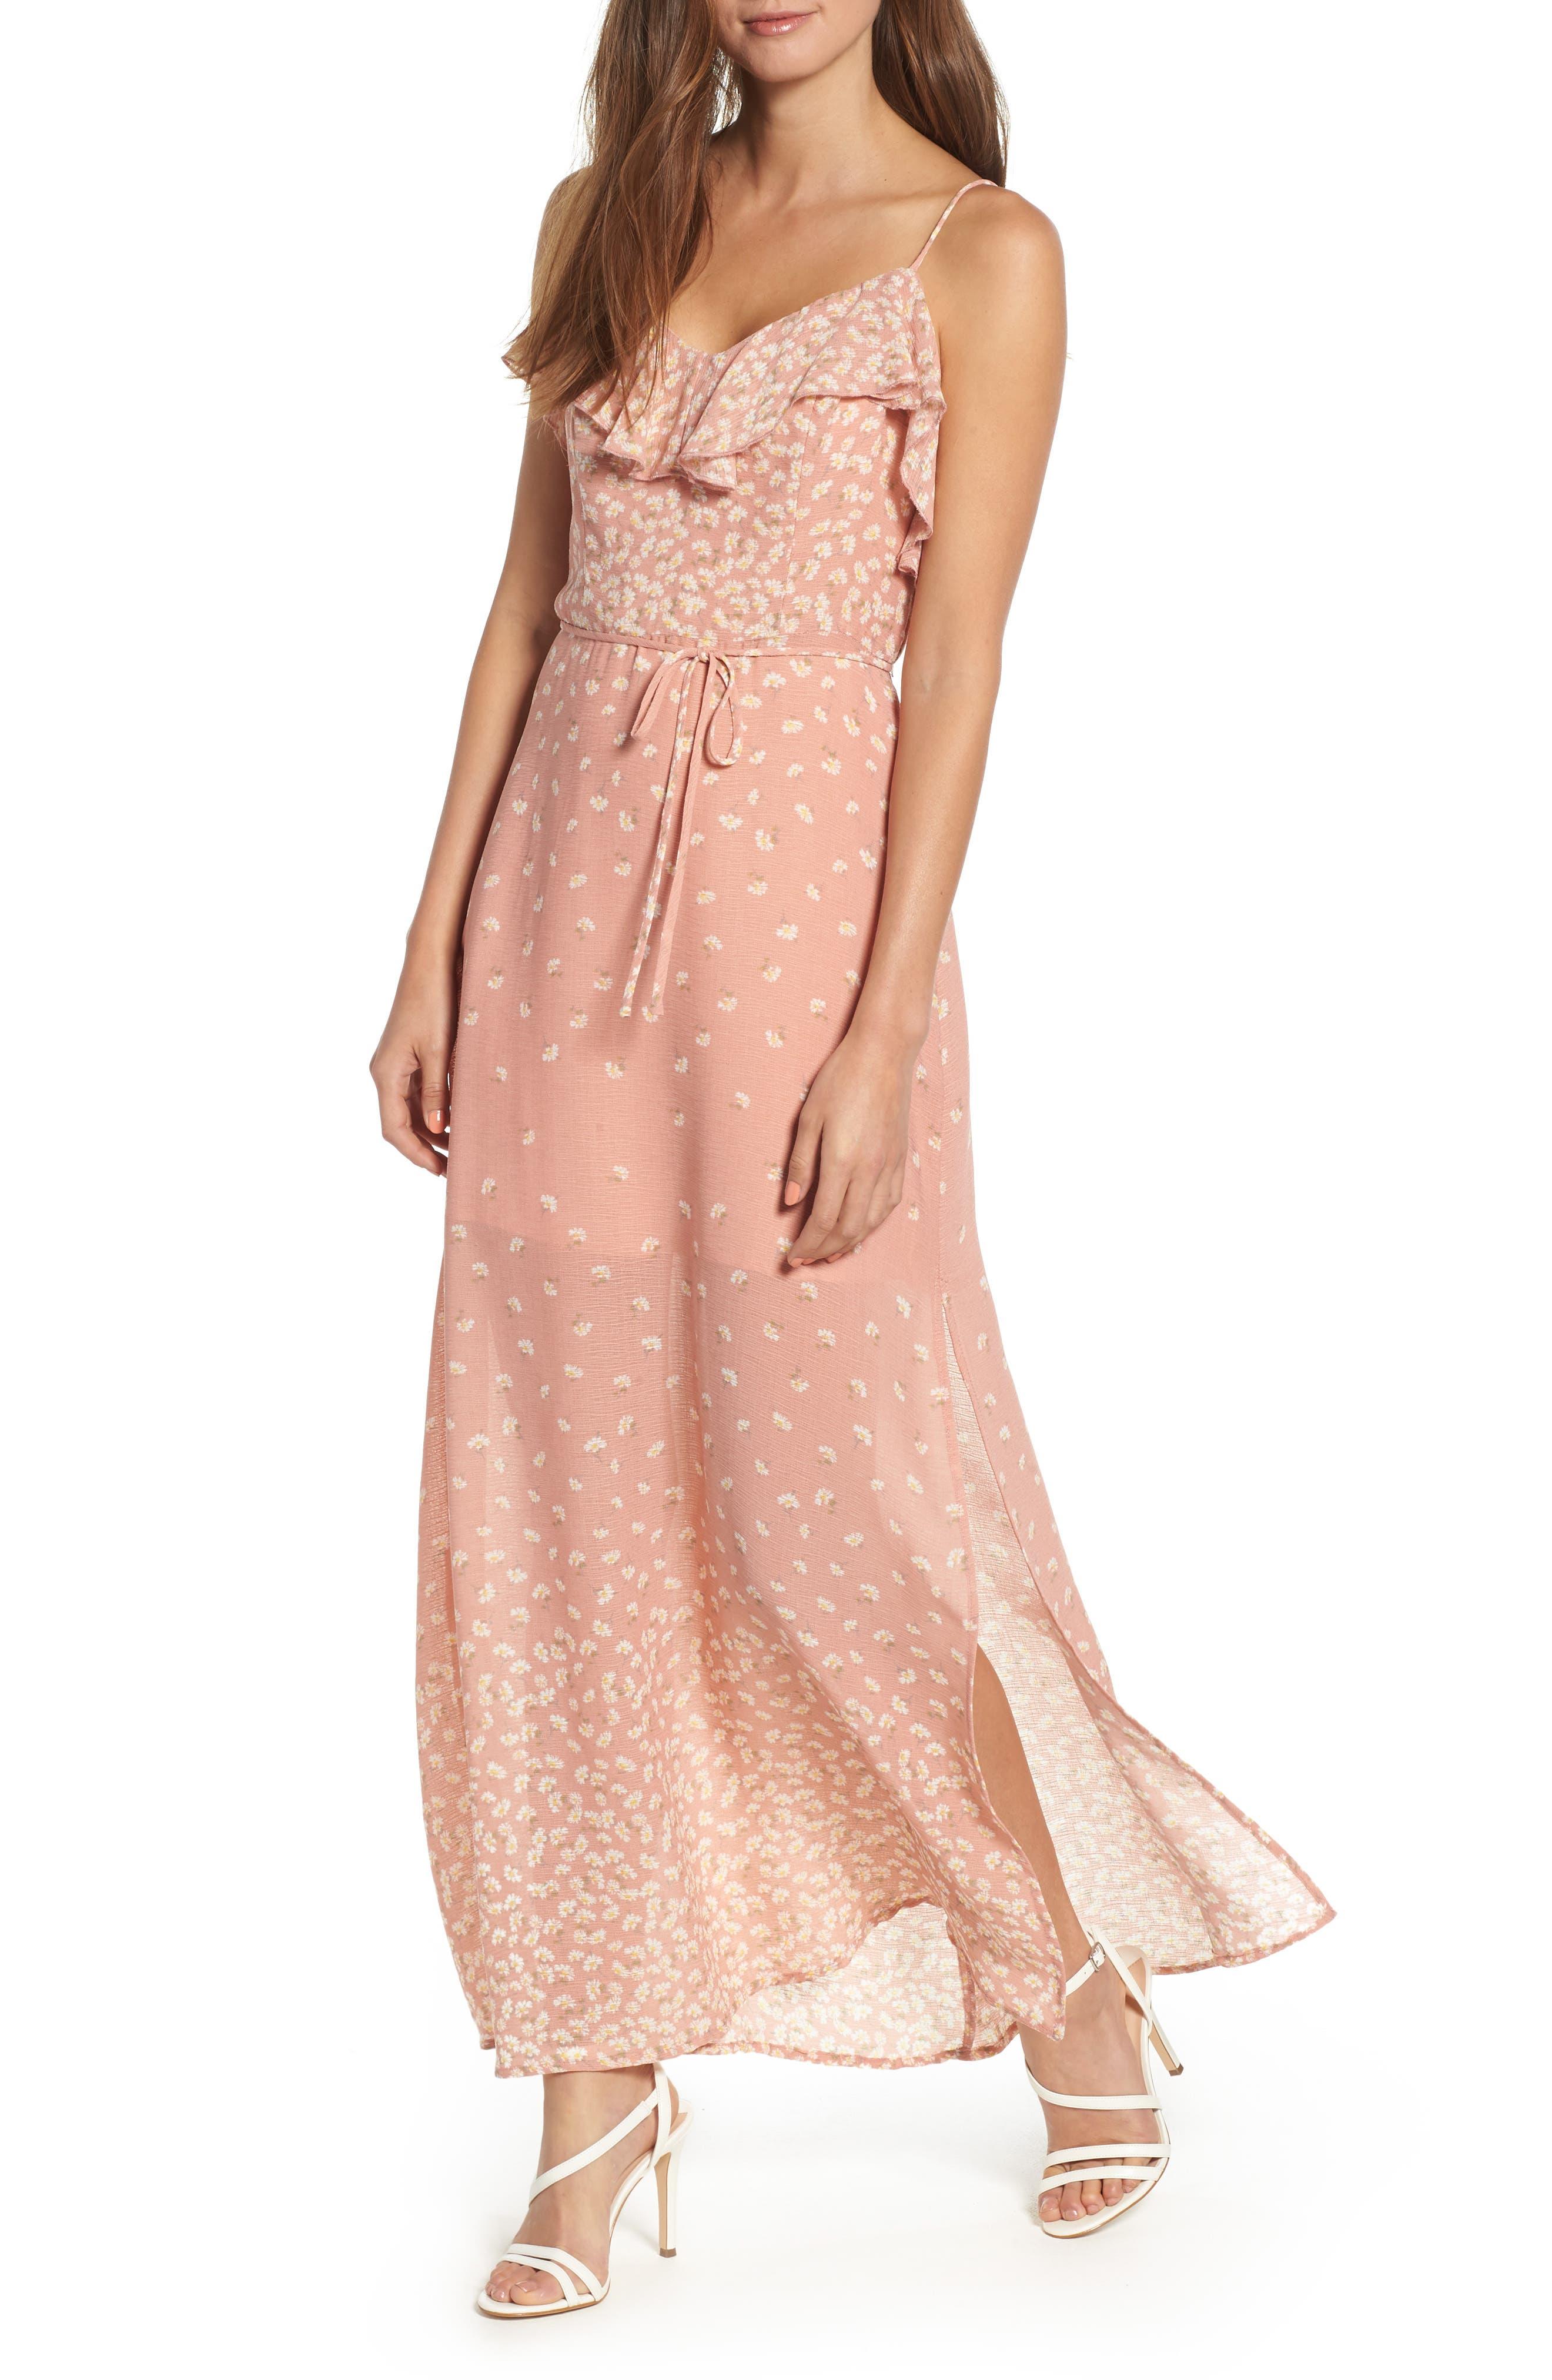 JUNE & HUDSON FLORAL MAXI DRESS